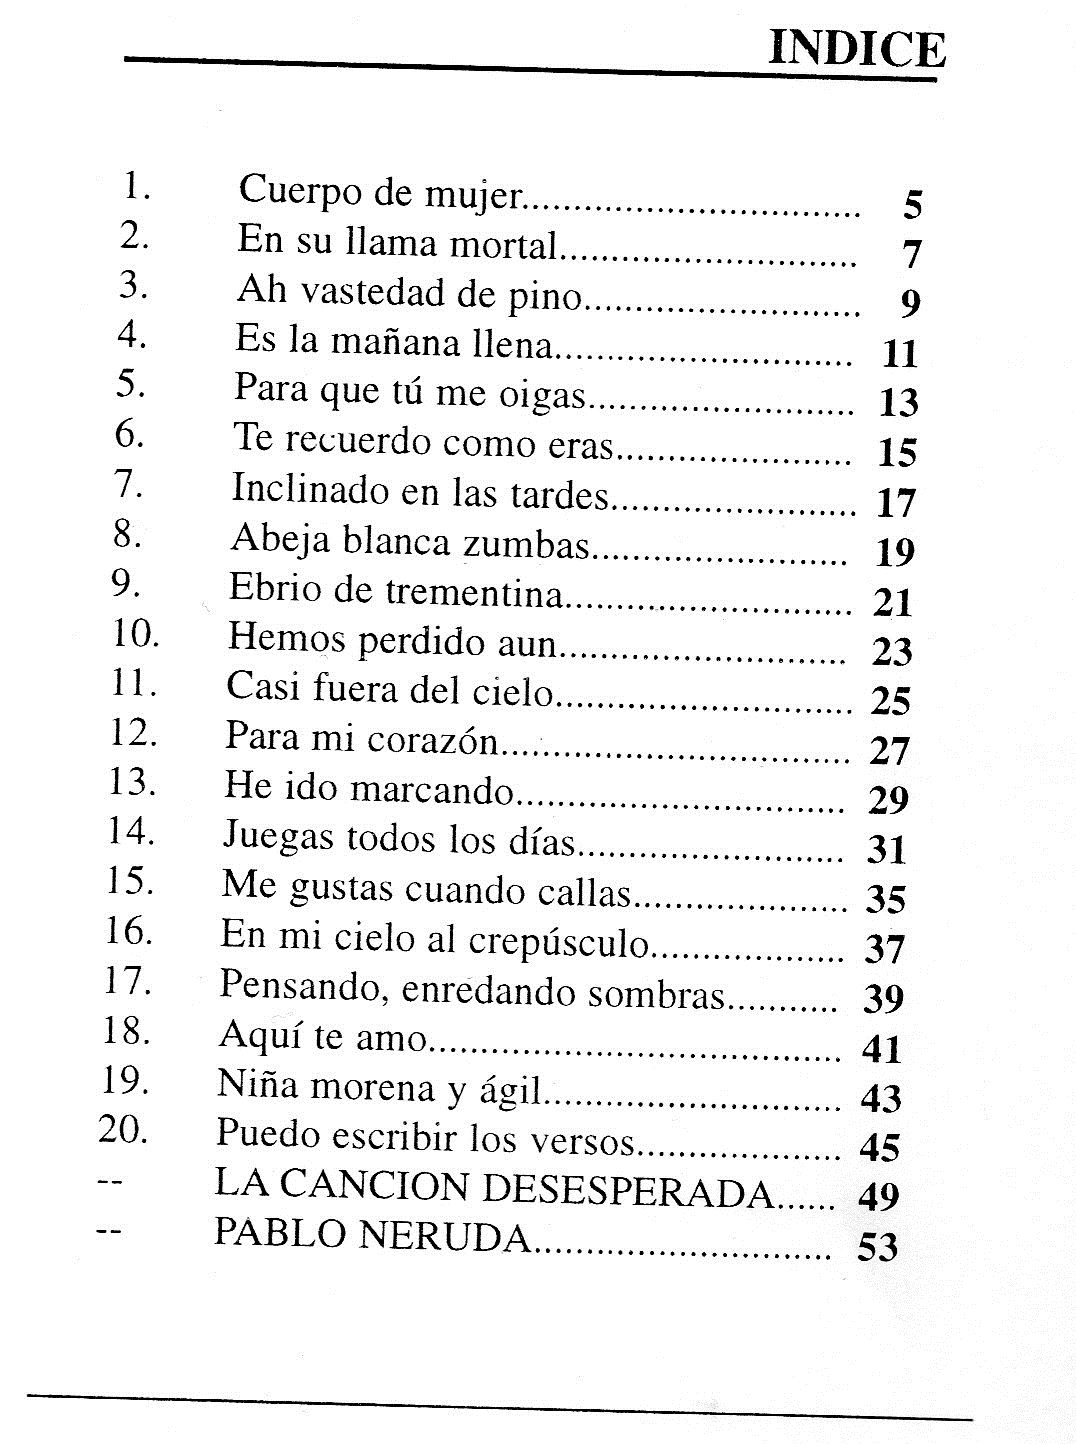 LITERATURA - image/jpeg